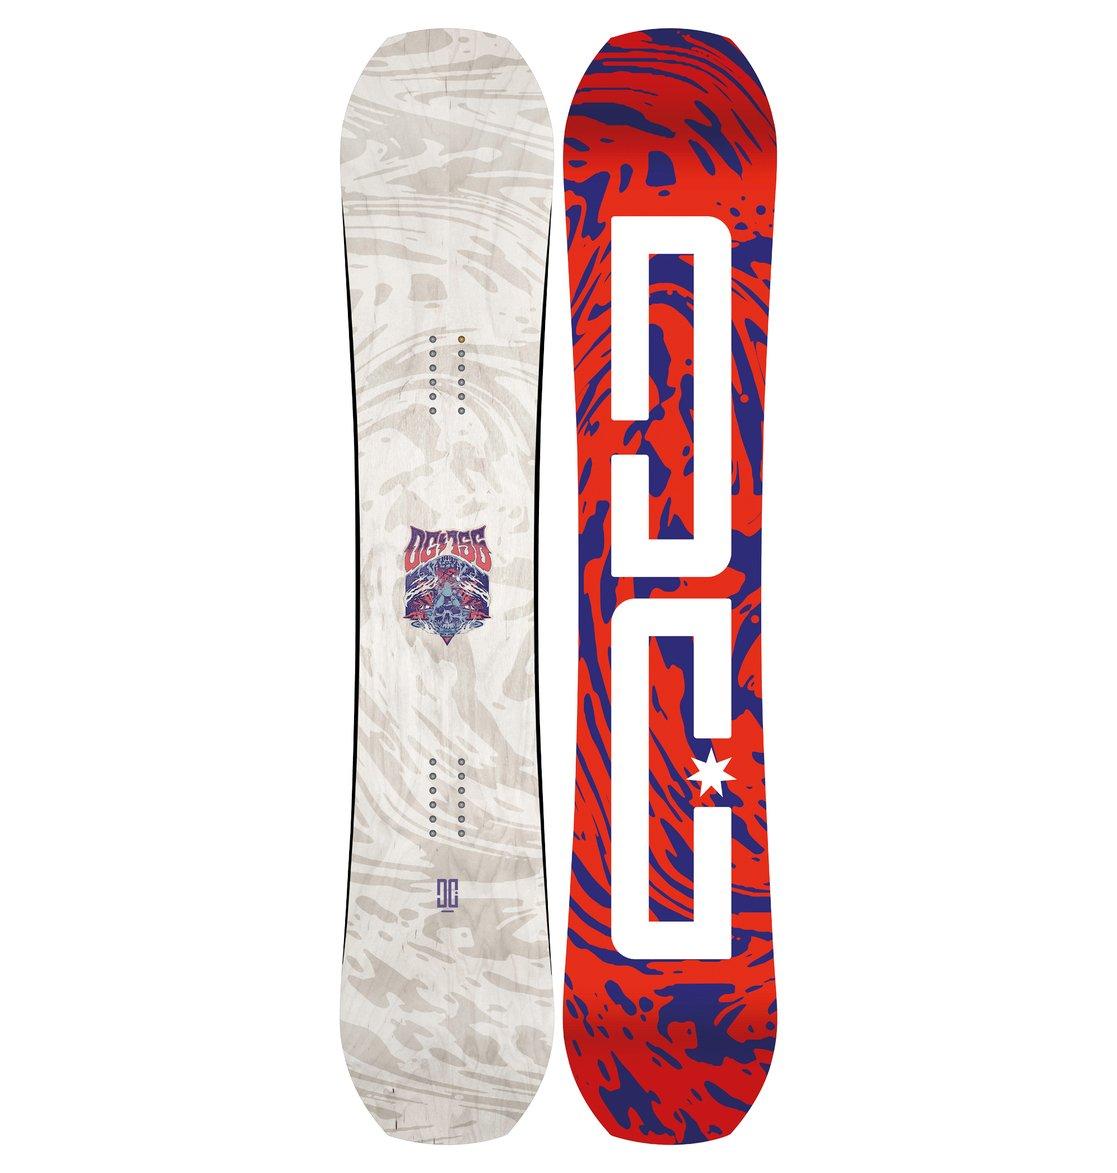 chaussures de sport 71e29 e5a51 The 156 Snowboard